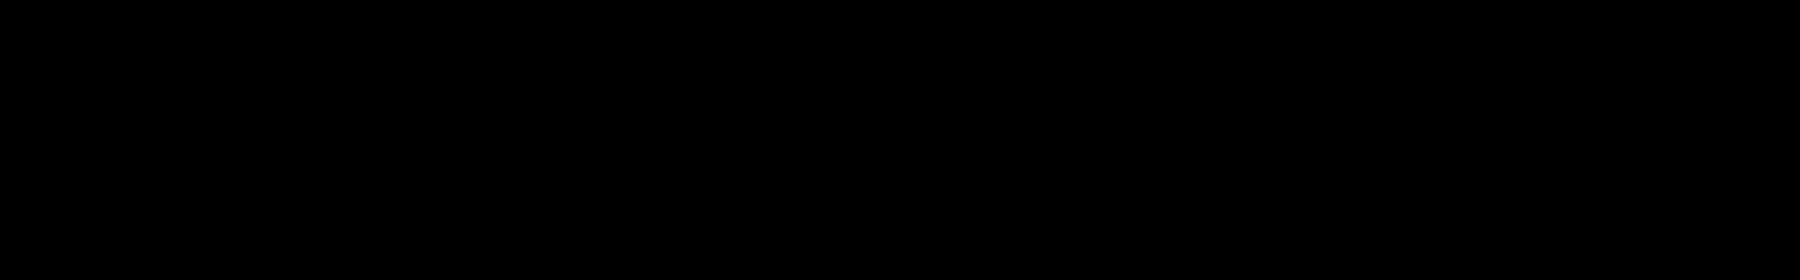 Disco Loops audio waveform